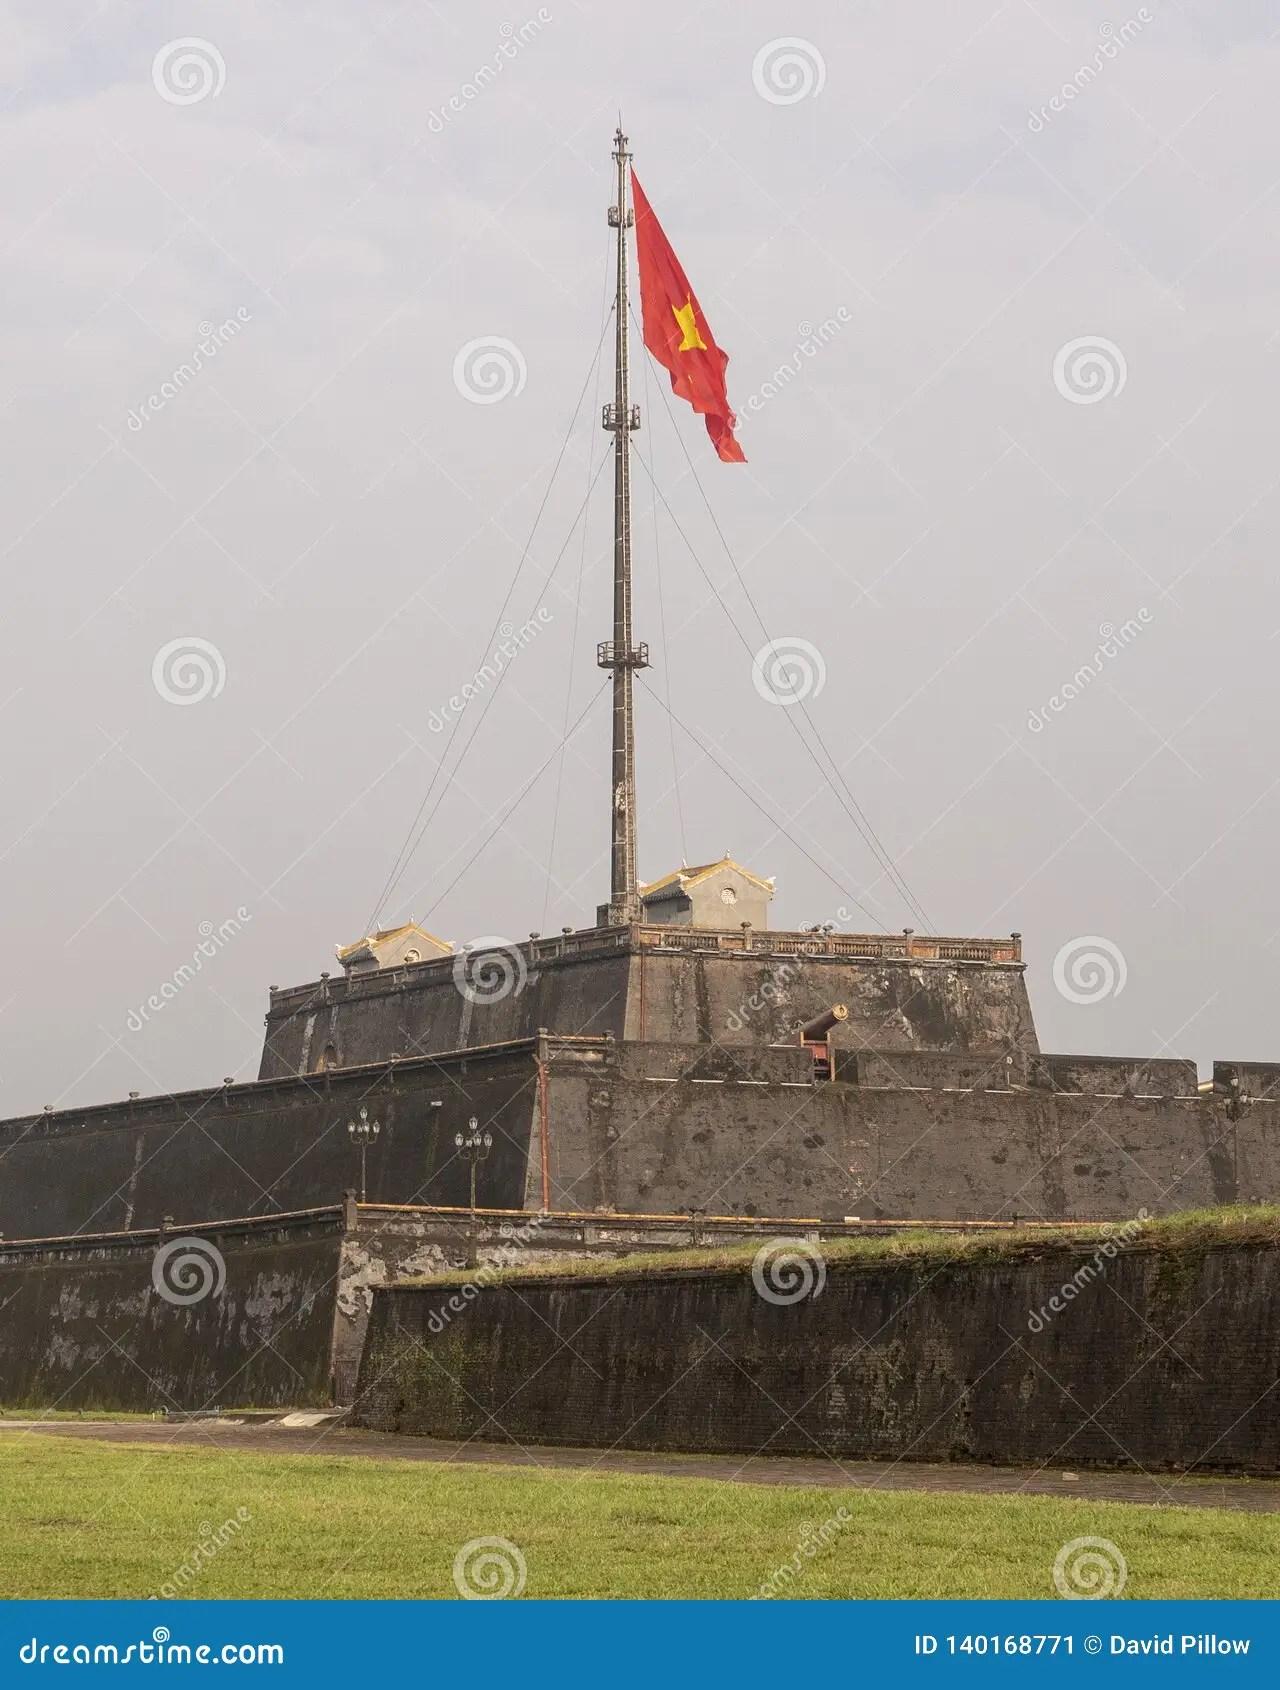 Drapeau Rouge Avec Etoile Jaune : drapeau, rouge, etoile, jaune, Drapeau, Citadel, Vietnam, Image, Stock, Trois,, Rouge:, 140168771